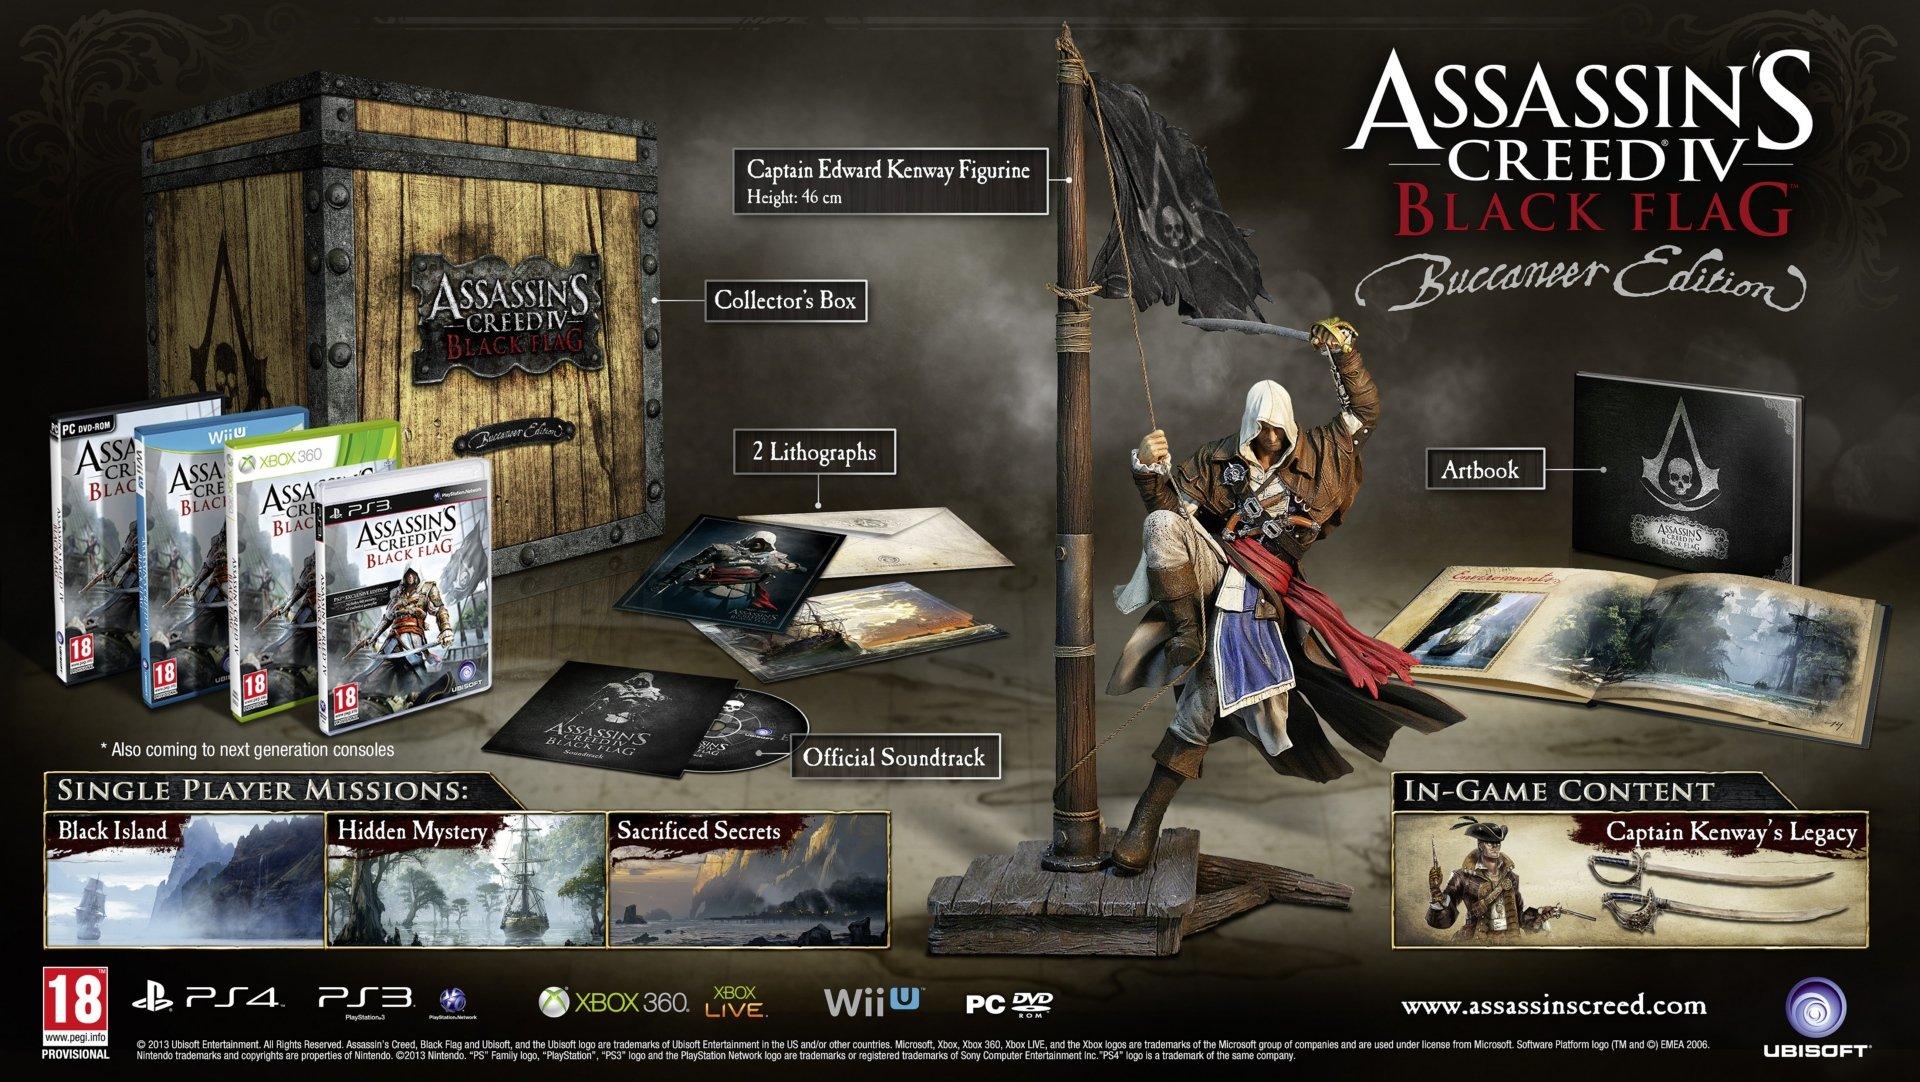 youtube.com/watch?feature=player_embedded&v=2dtf-ezfytMAssassin's Creed 4: Black Flag - коллекционные издания и  .... - Изображение 2